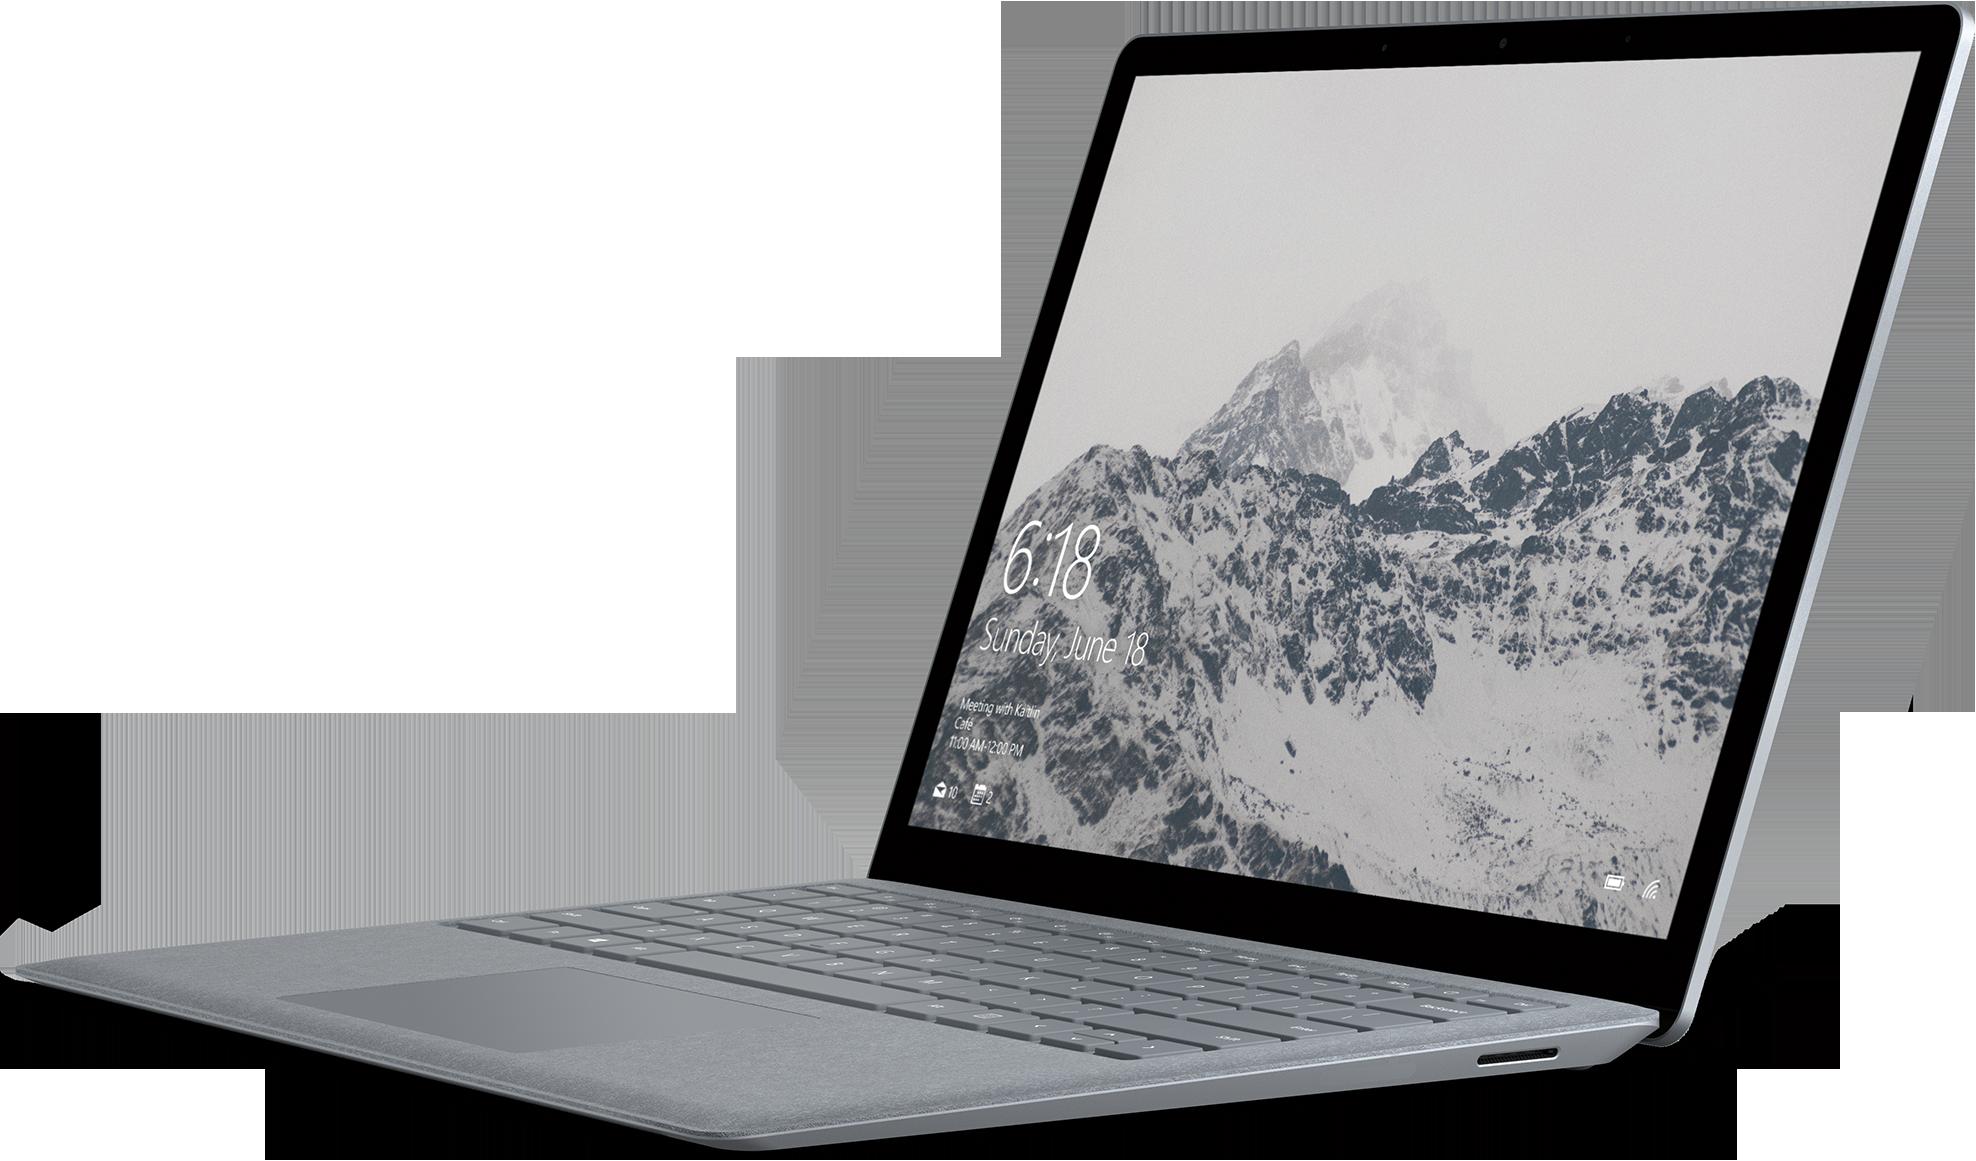 Microsoft Surface Laptop (Certified Refurbished) - Intel Core i5 / 256GB SSD / 8GB RAM - Platinum